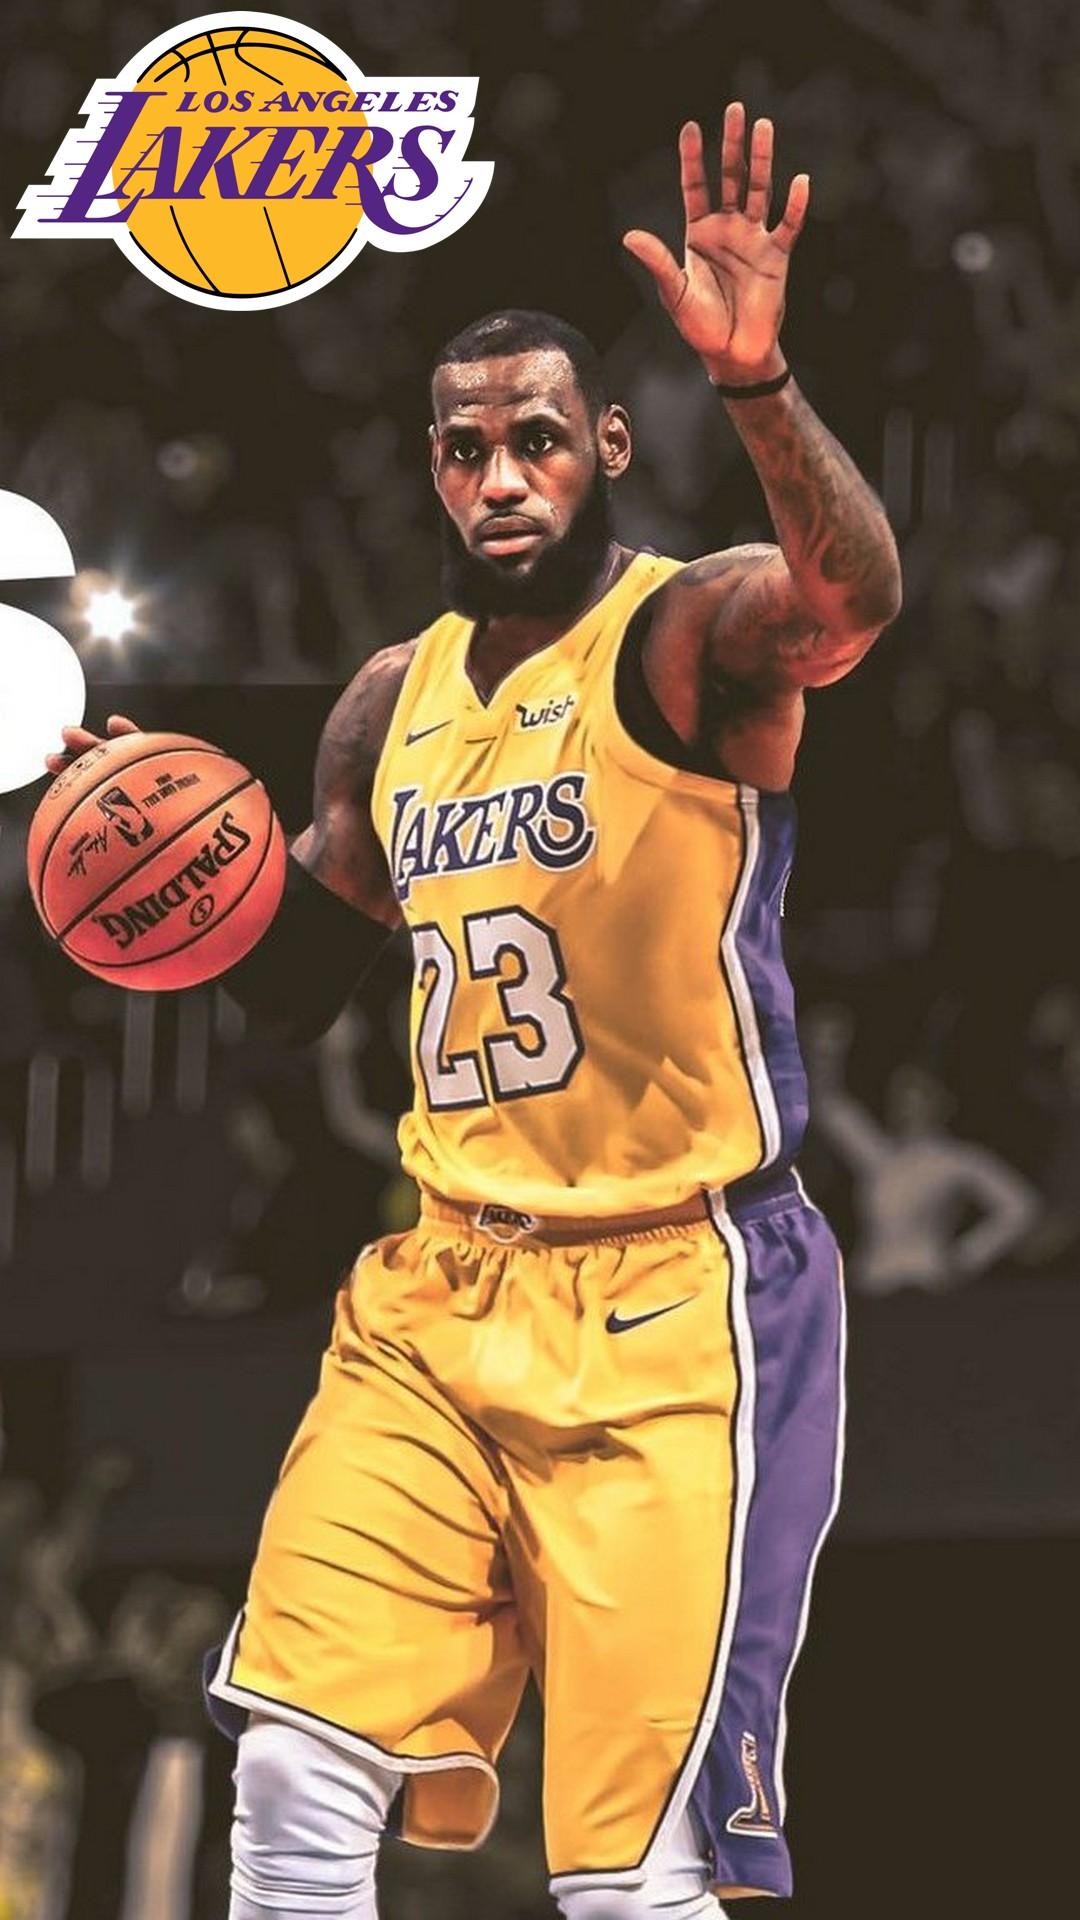 LA Lakers LeBron James HD Wallpaper For iPhone 2020 Basketball 1080x1920